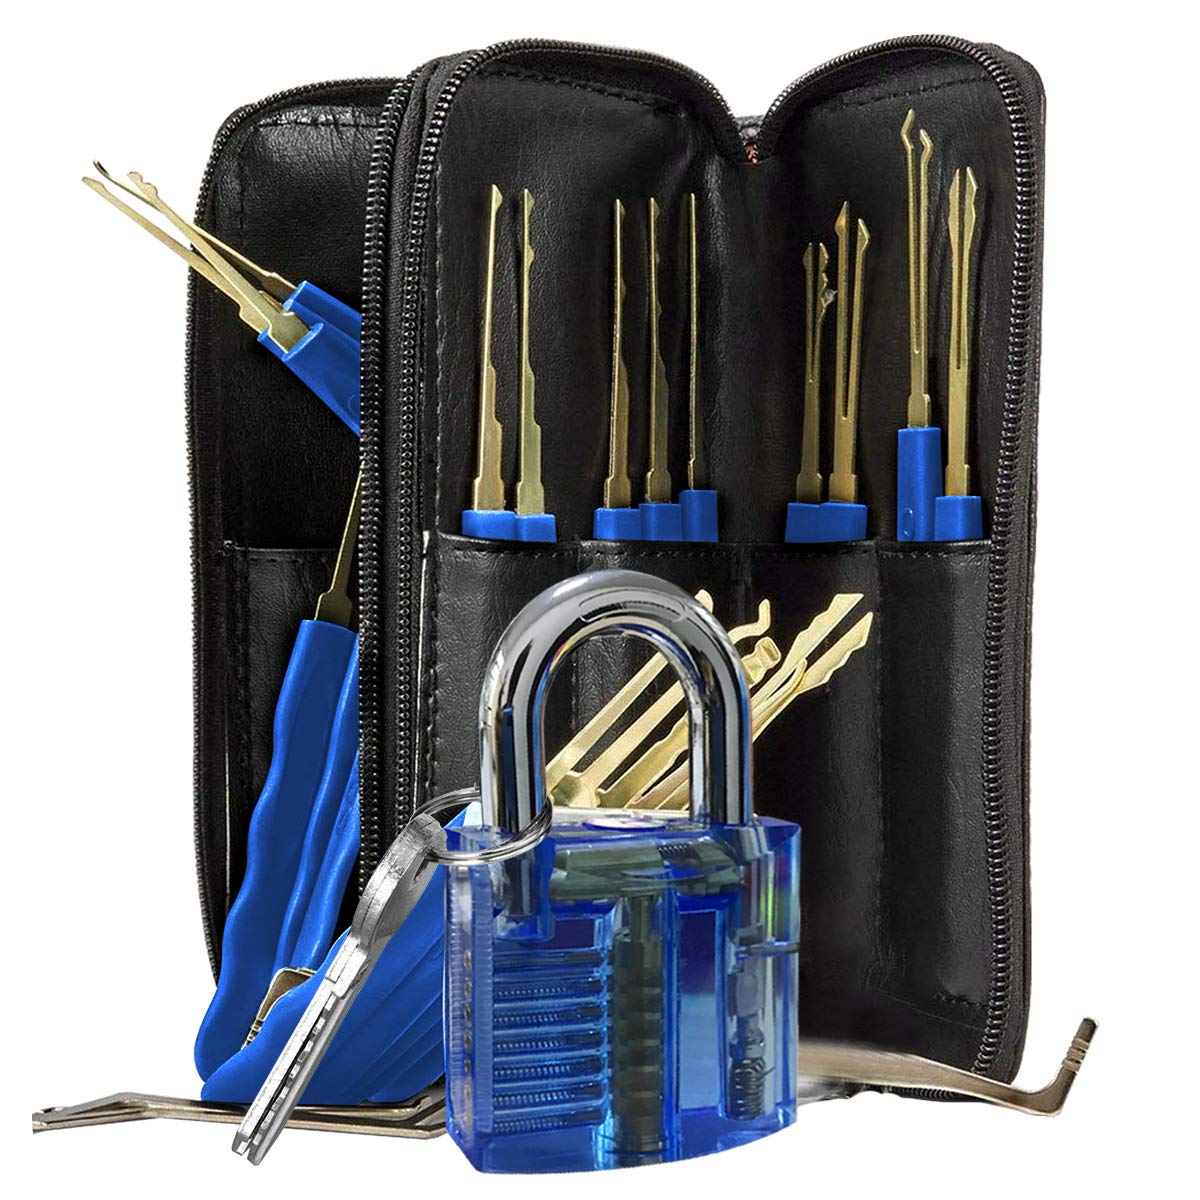 Lock Repair Set 24 PCS (Blue Lock) by A-GSL-GBB